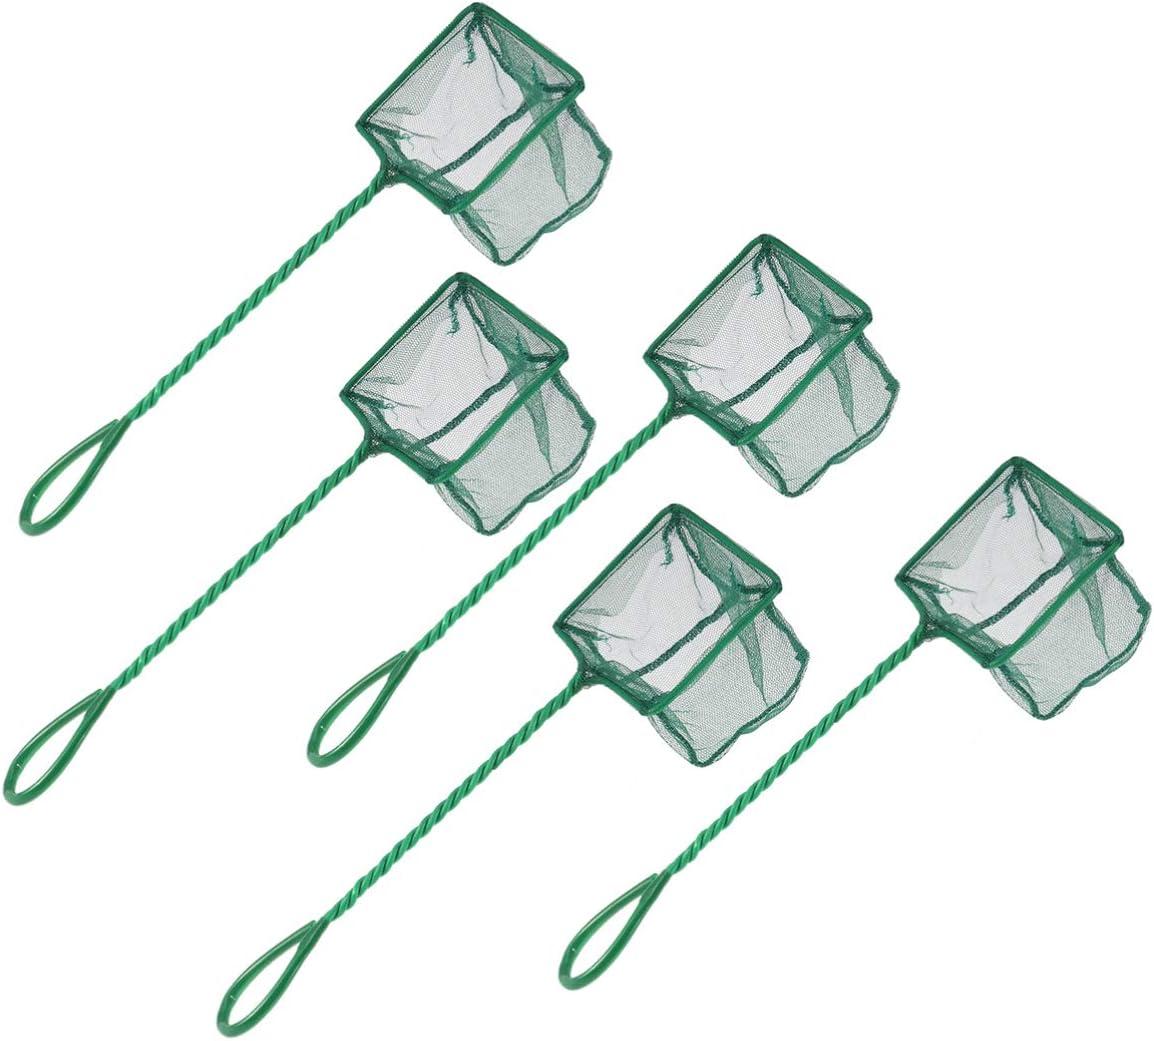 POPETPOP Max 68% OFF 5pcs New product Fishing Net Shrimp Handle Landi Fine Dip with